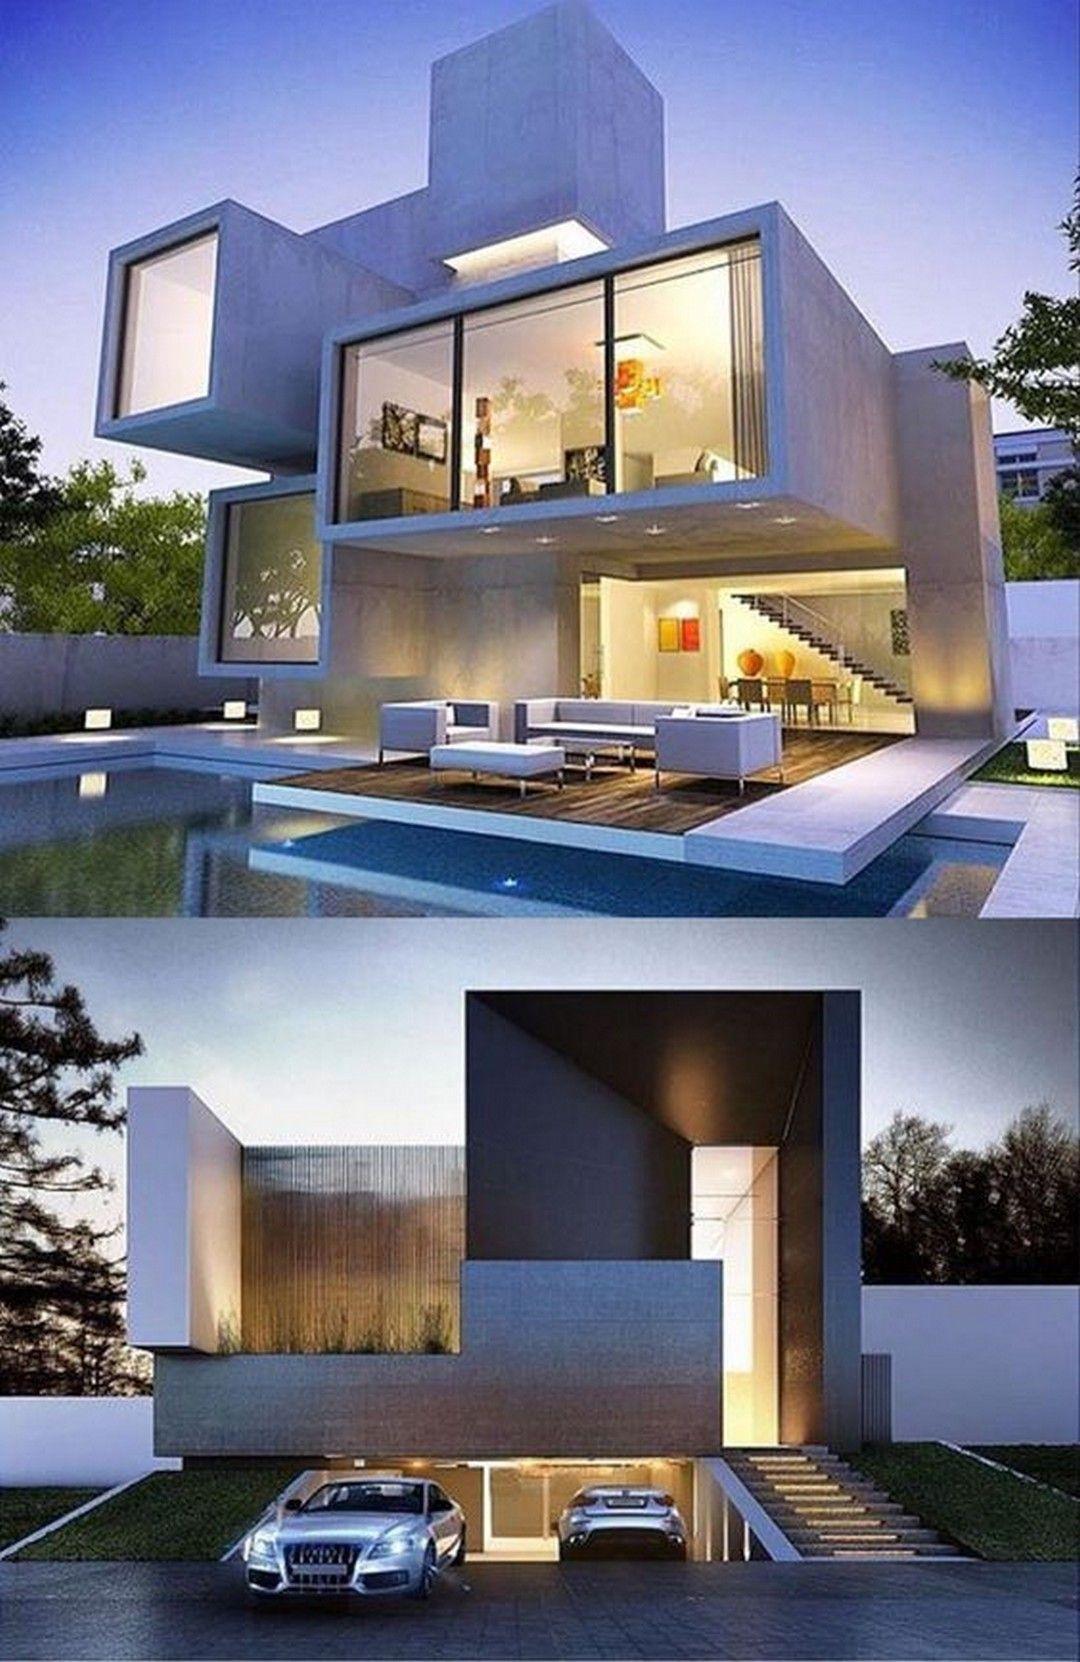 28 Best Modern House Design Interior Ideas House Architecture Design Architecture House Dream House Exterior